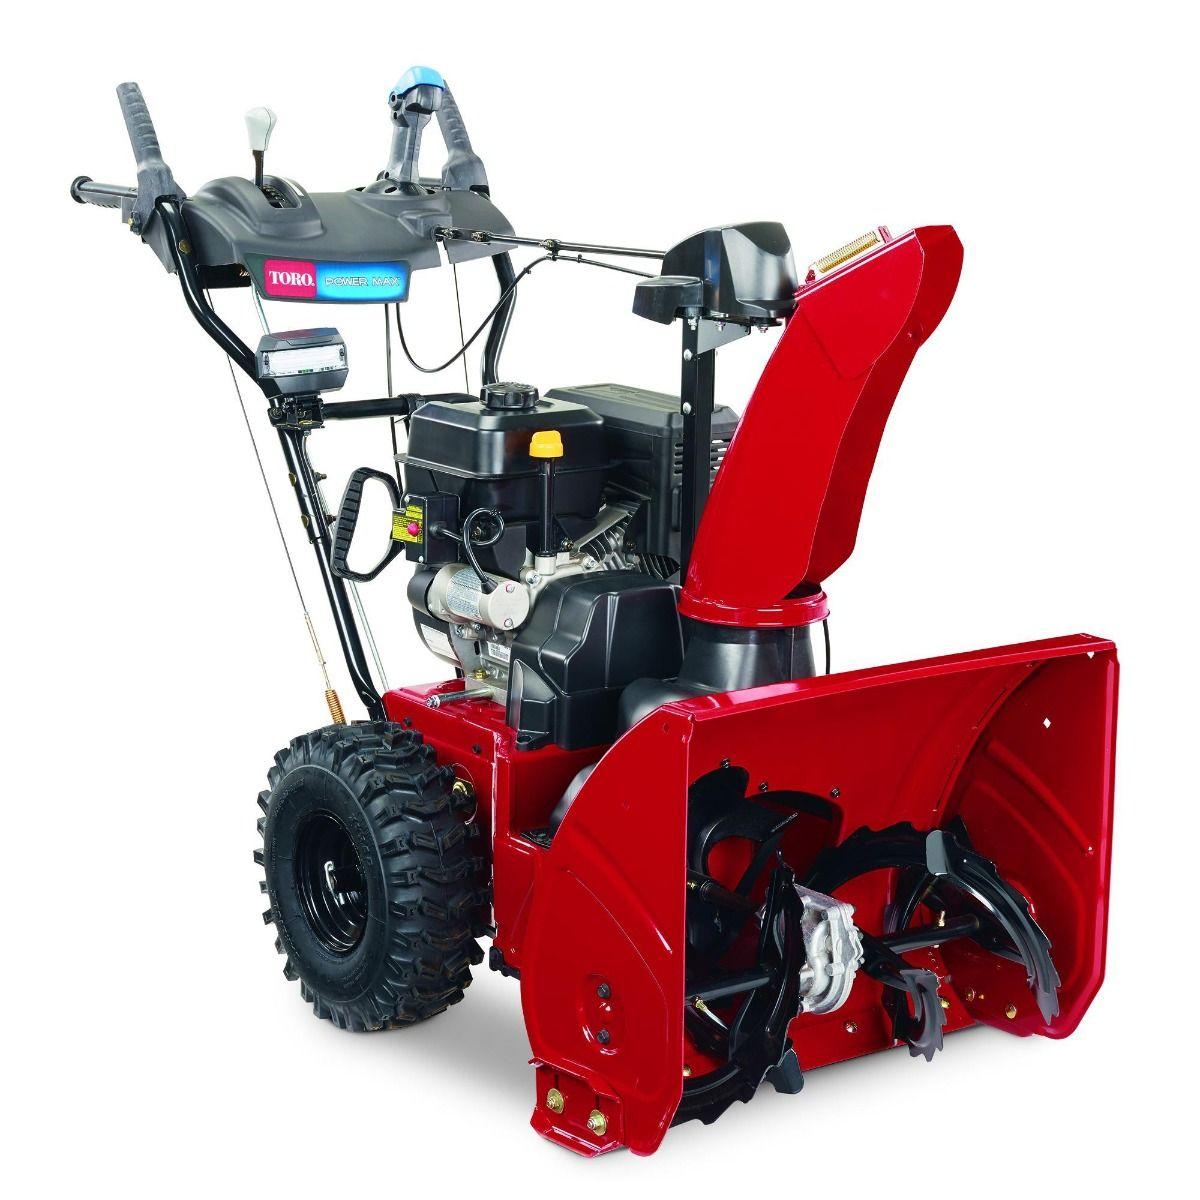 Toro 37799 Power Max 826 OXE Snowblower